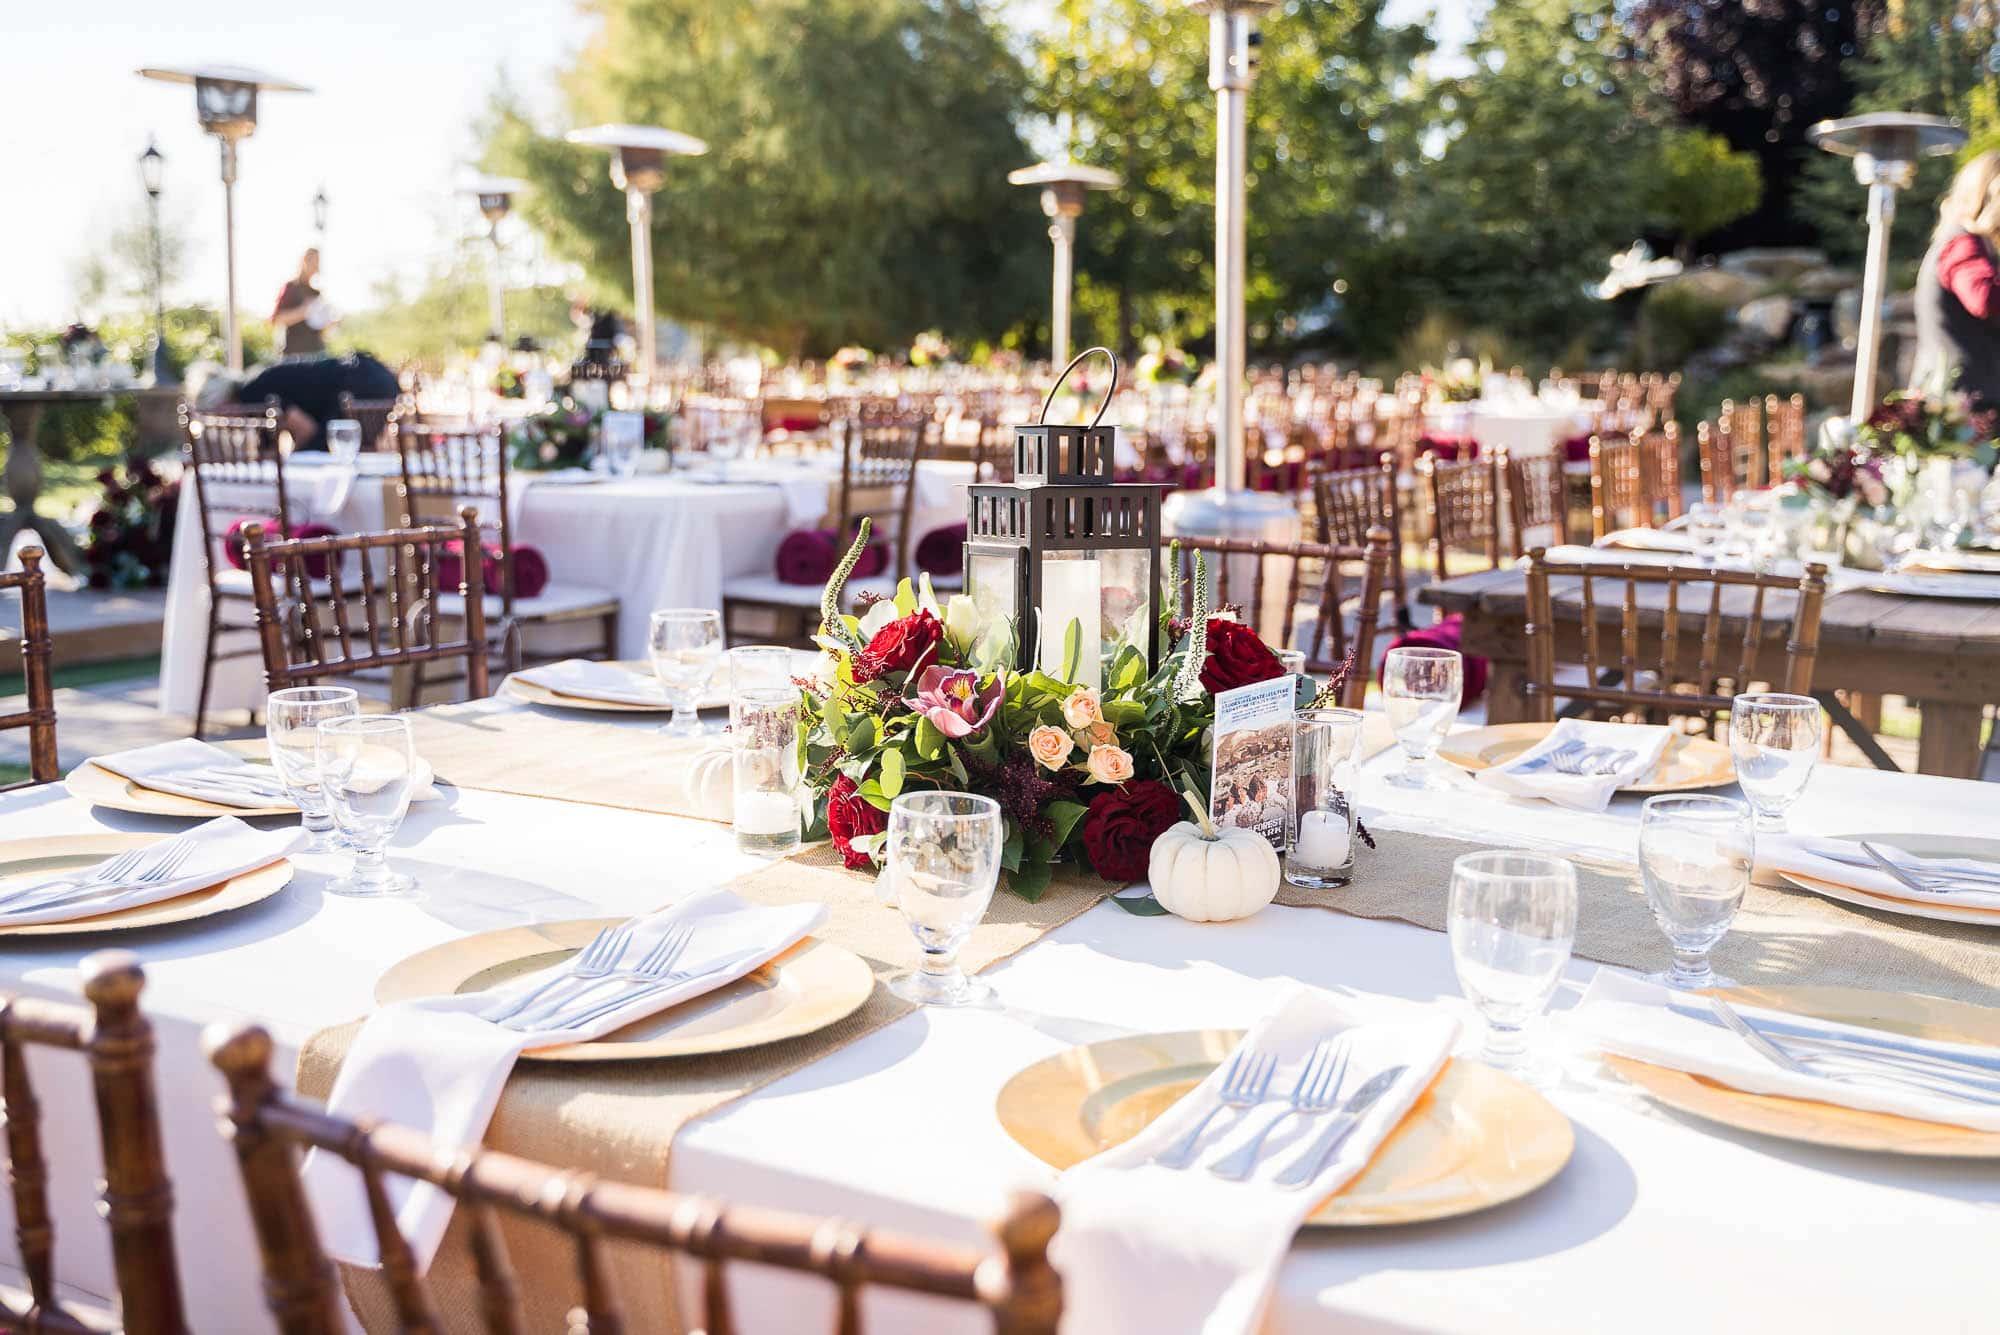 451_Alan_and_Heidi_Serendipity_Garden_Wedding_10-27-2018